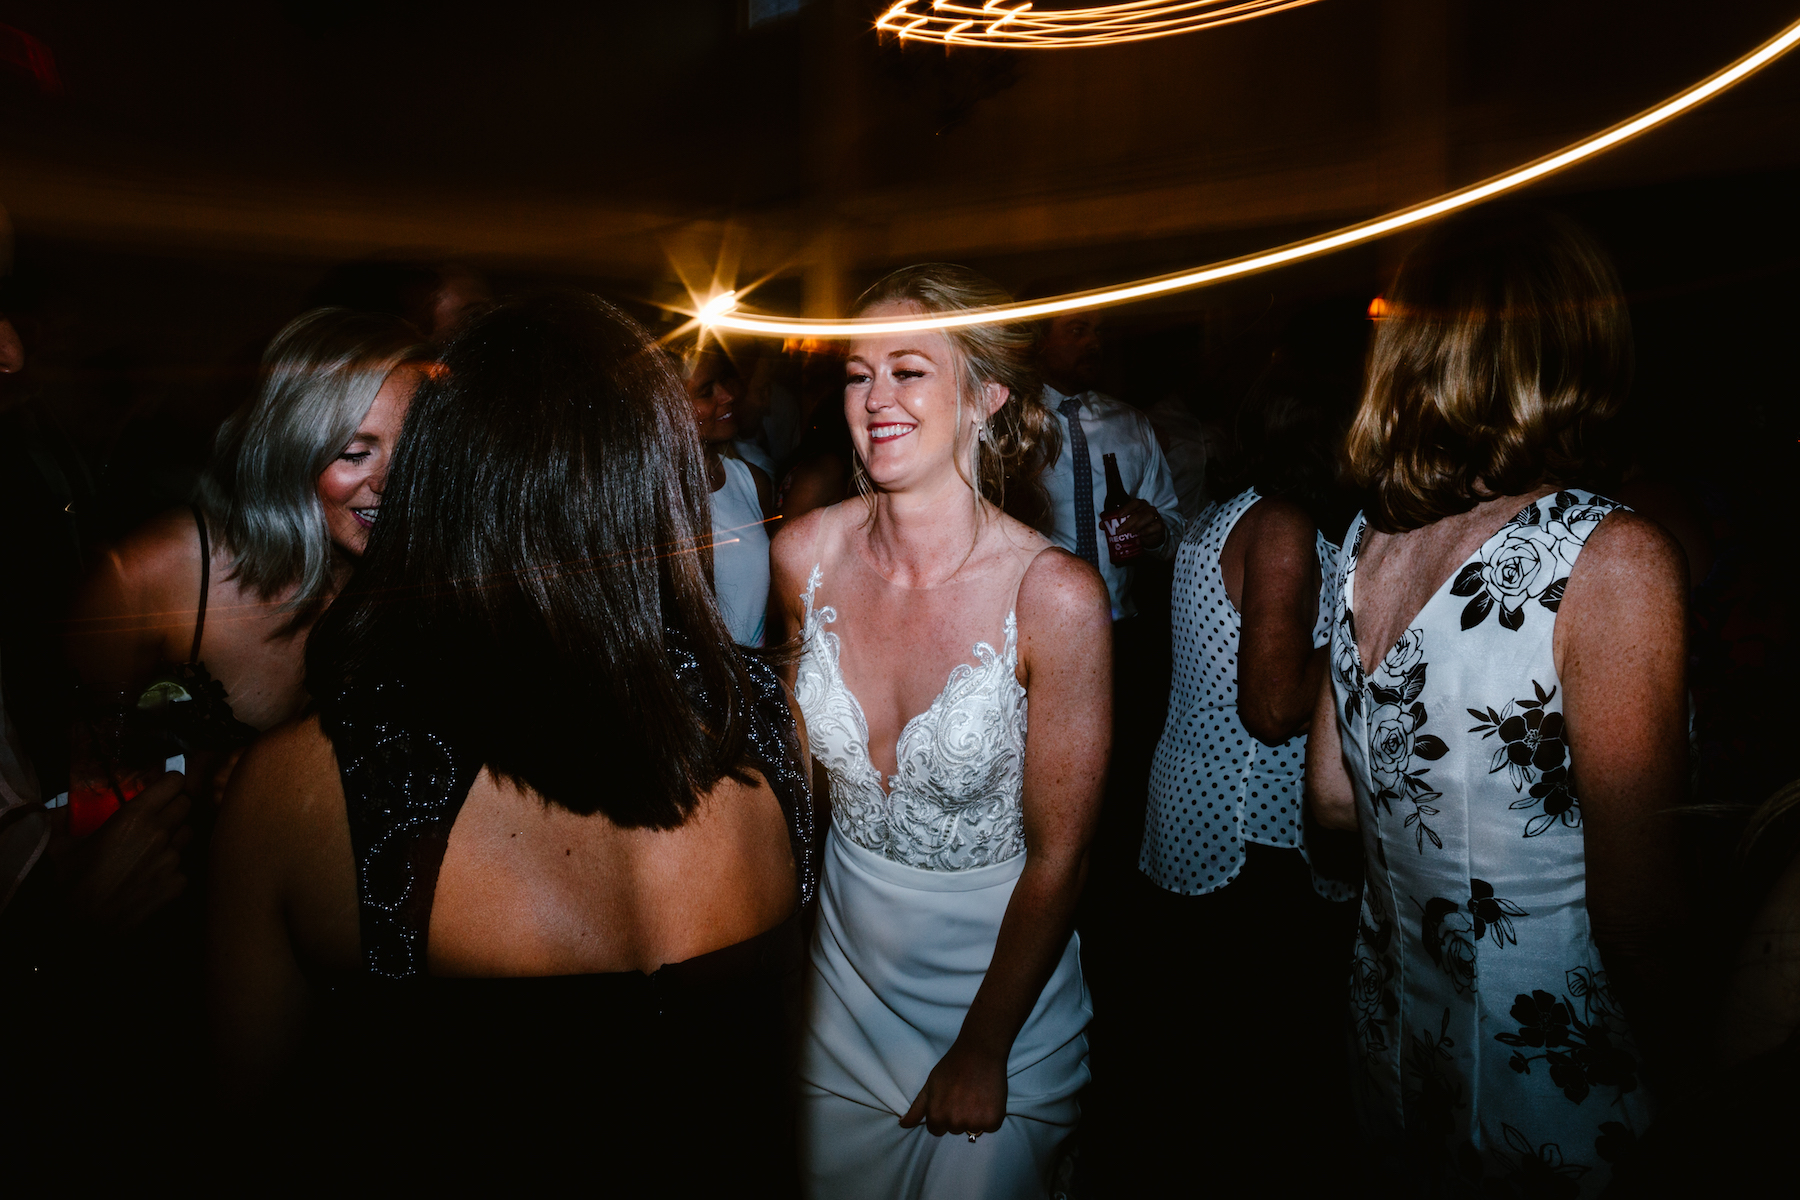 wedding-engagement-photographer-spartanburg-greenville-columbia-carolina-south-north-540.JPG